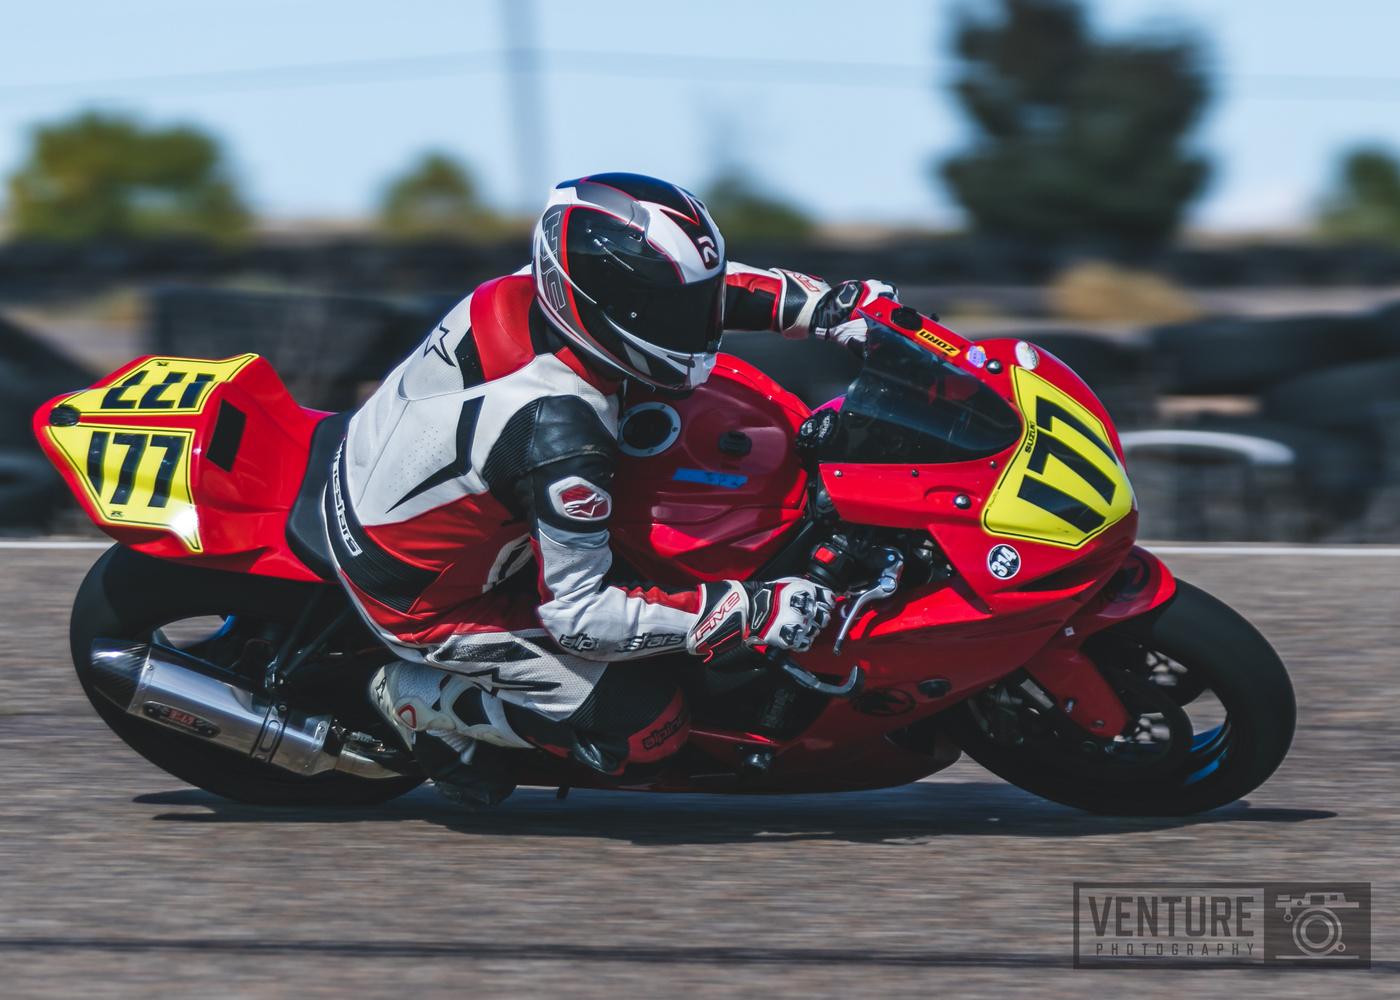 Speed by Rob Burnside